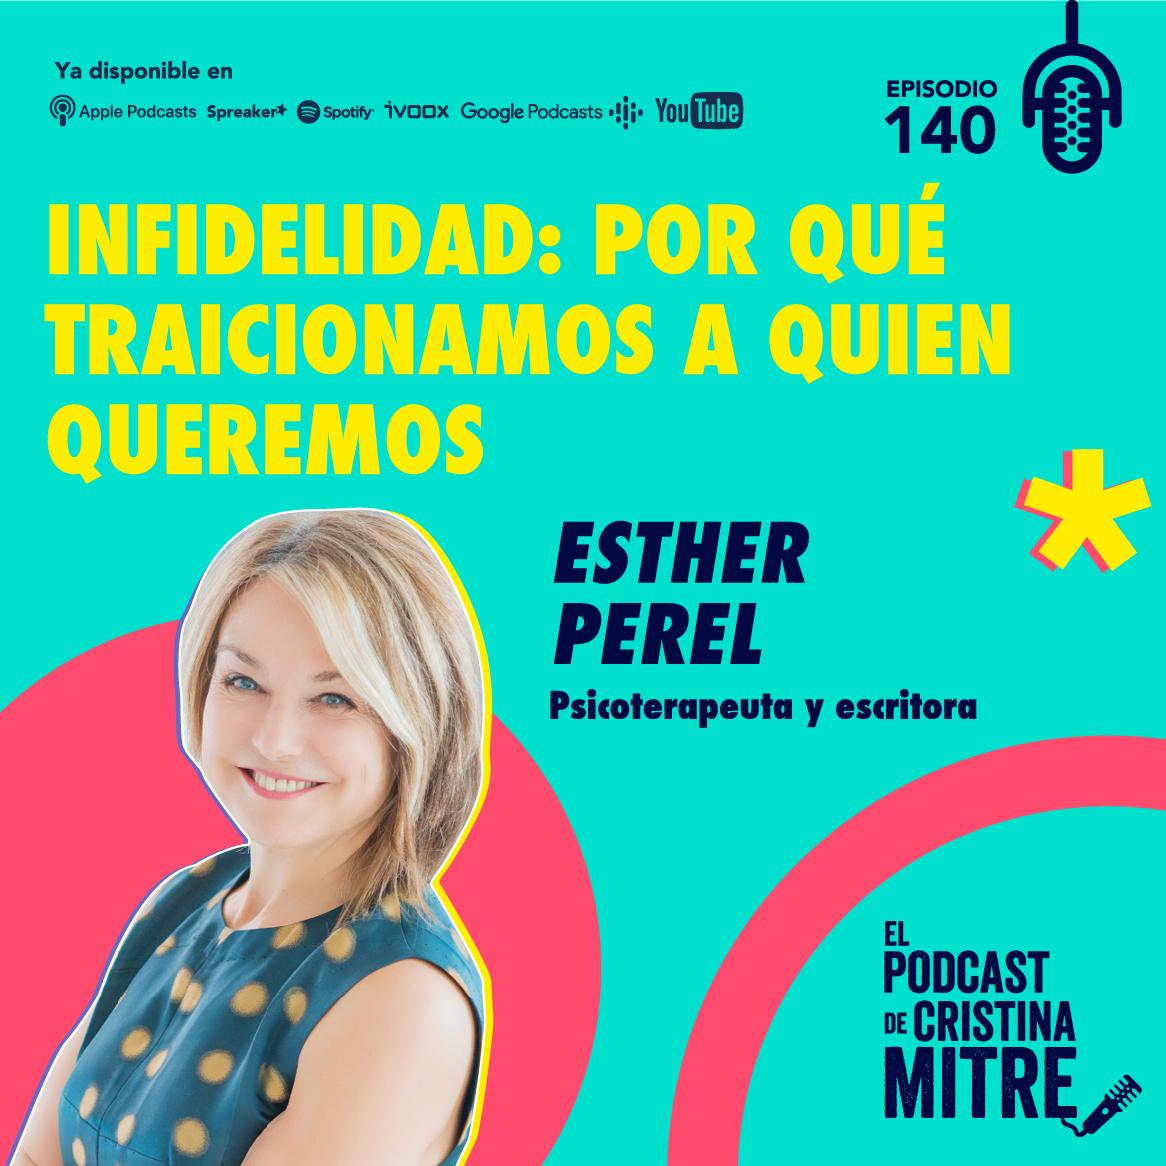 Esther Perel podcast en español